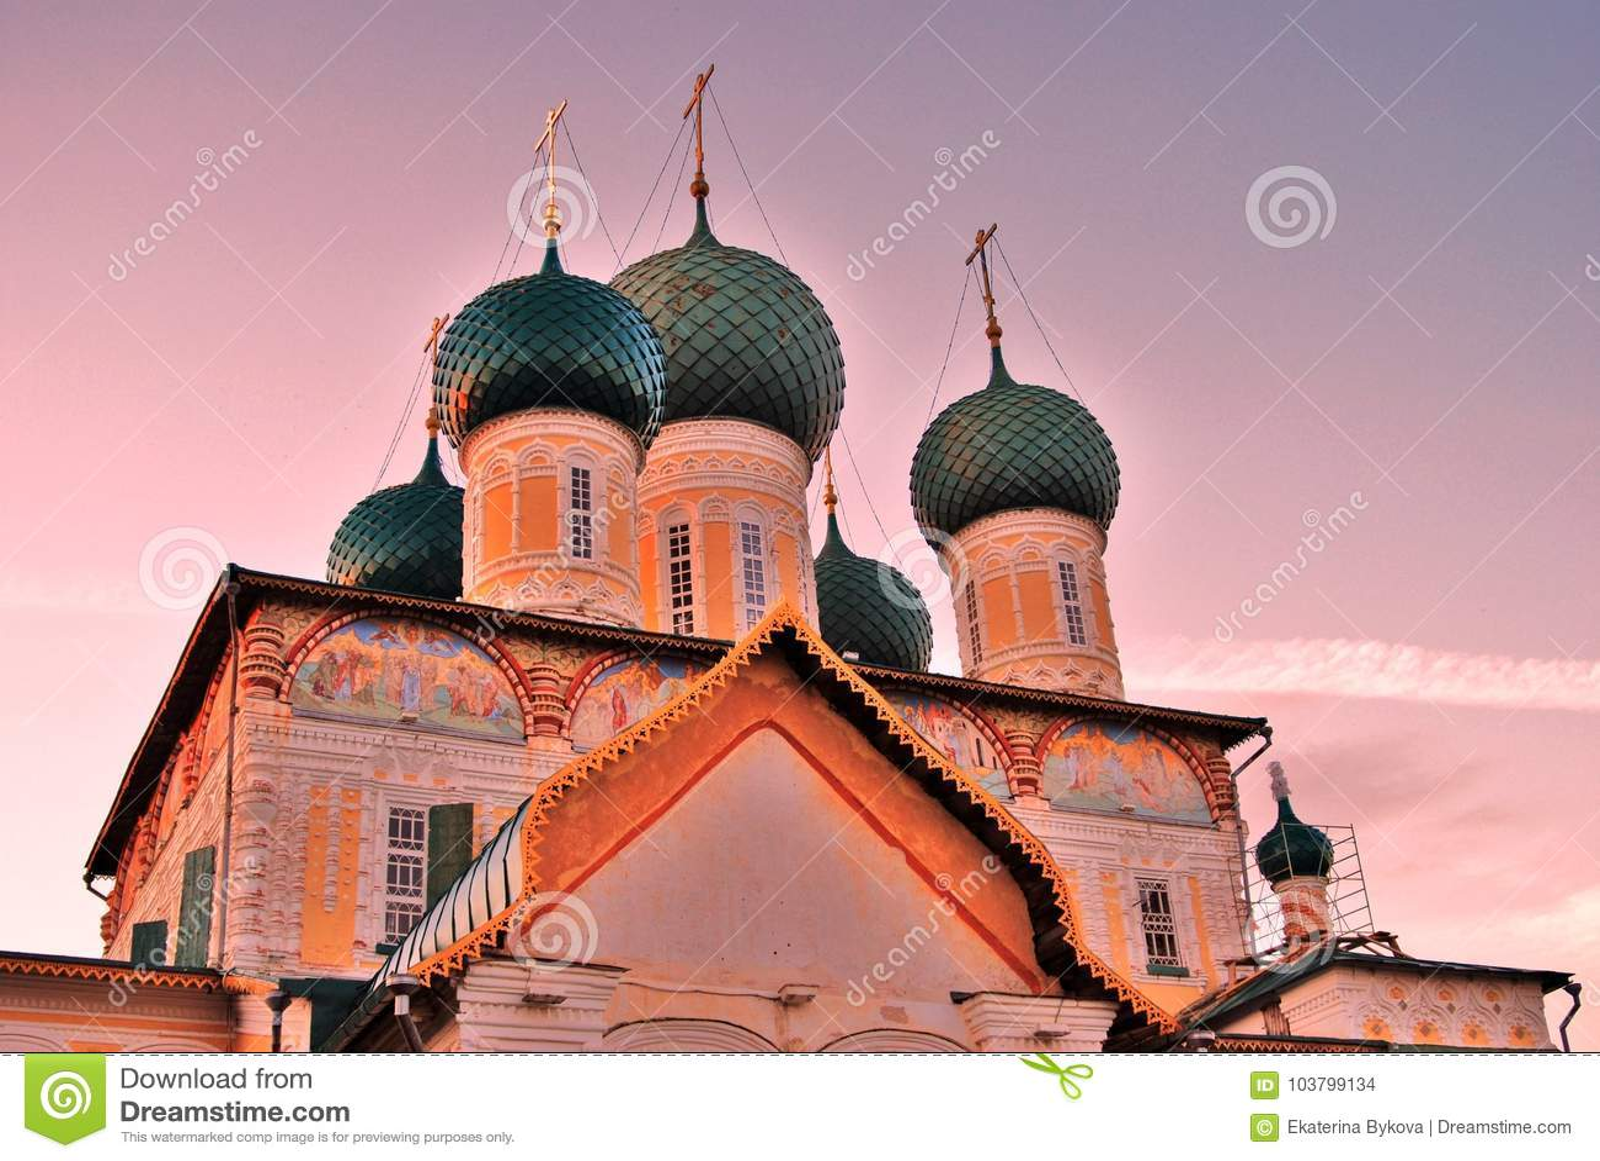 Resurrection Cathedral Tutaev: photos, address and history 17